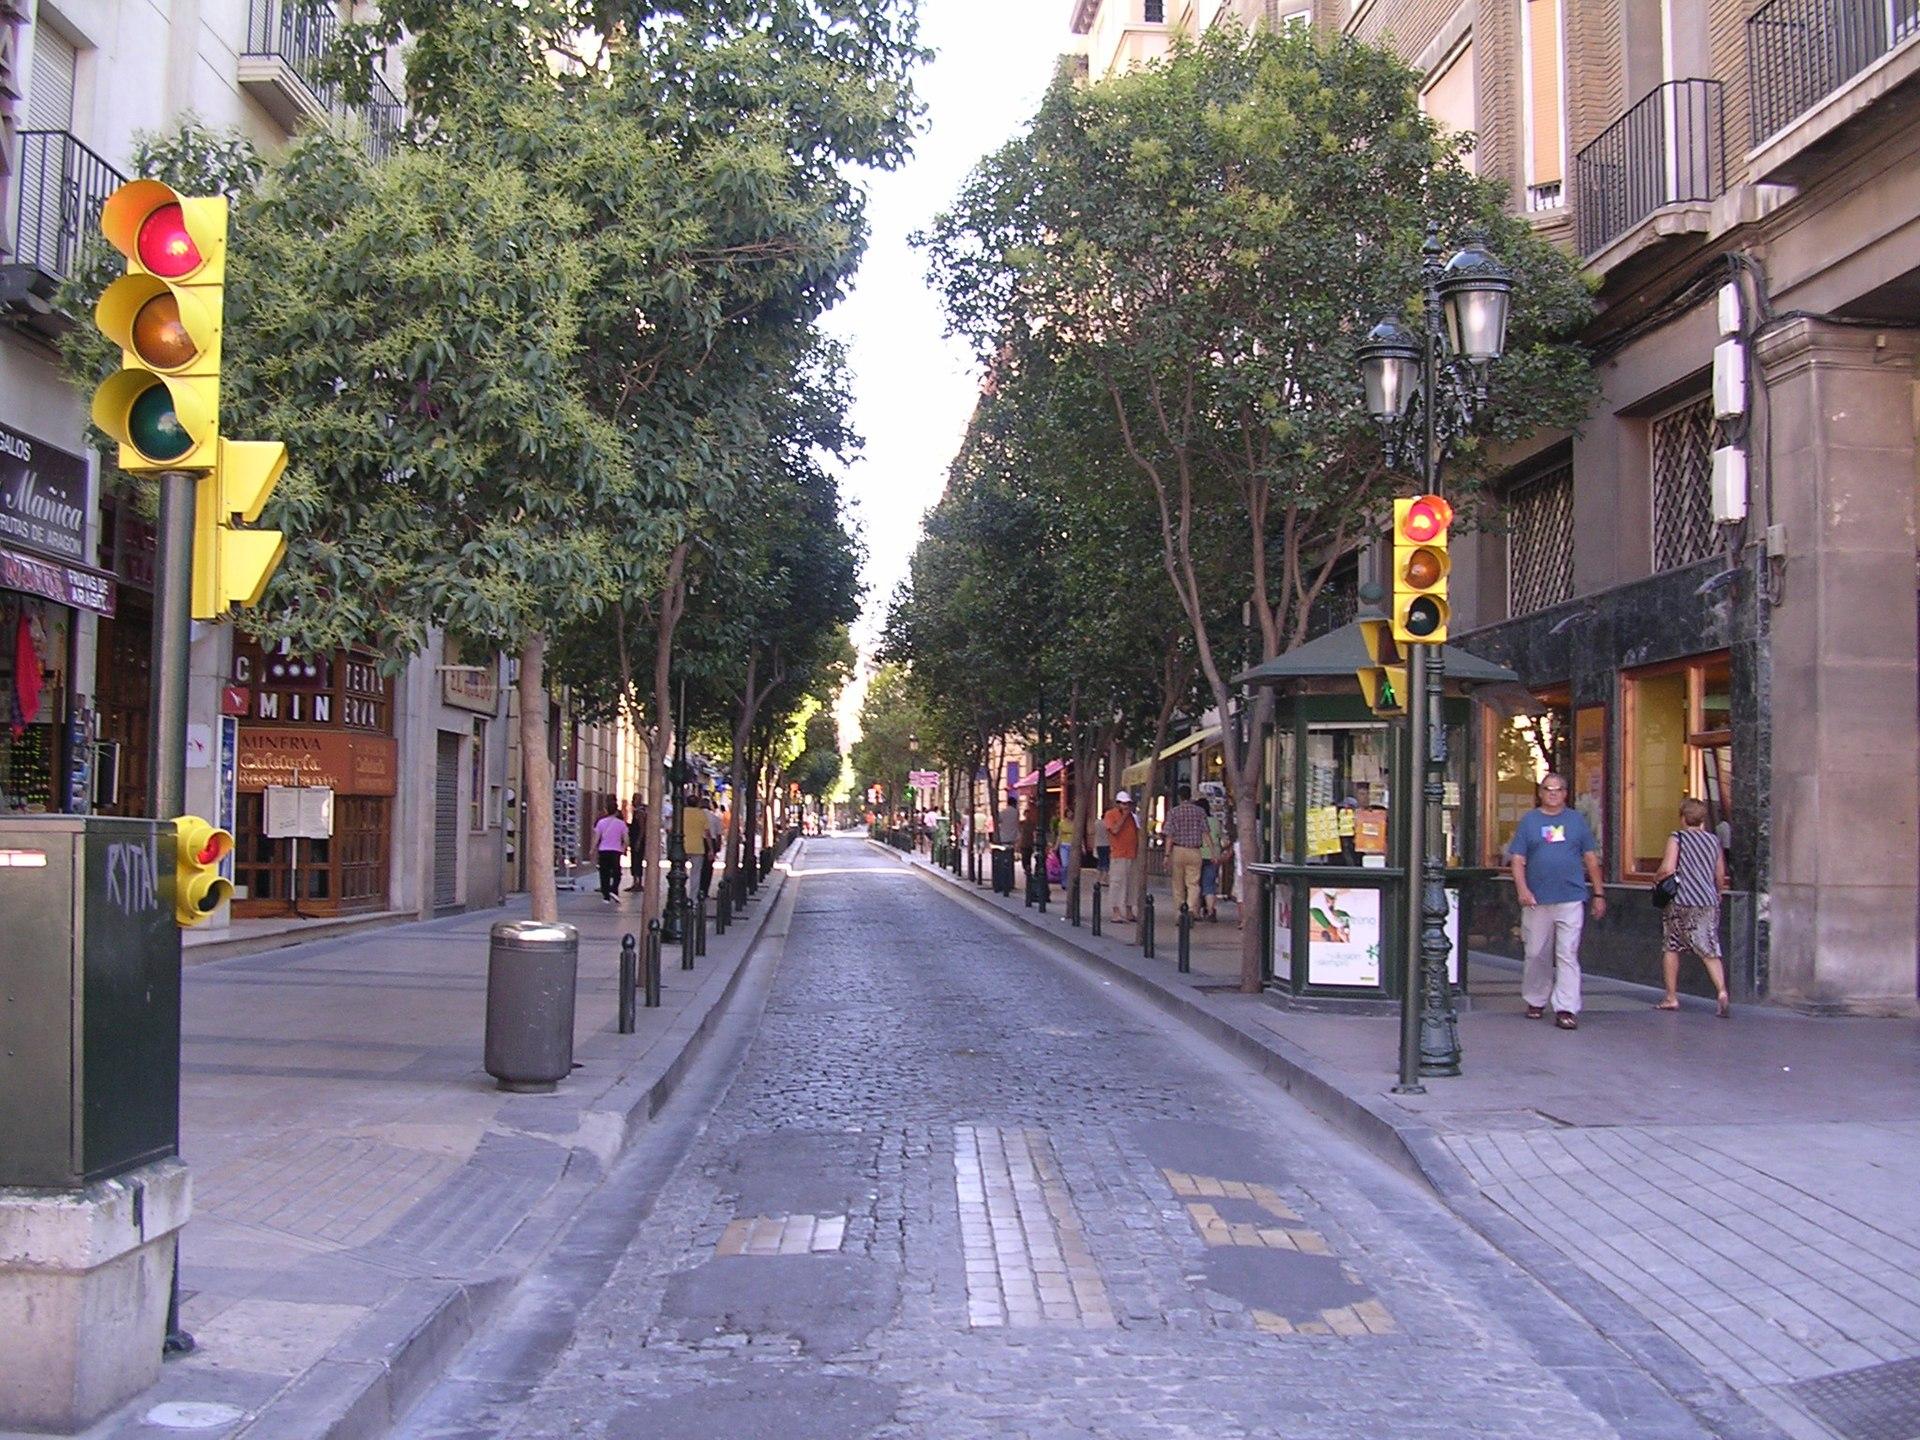 Paseo por la calle en brasil 25 - 1 1